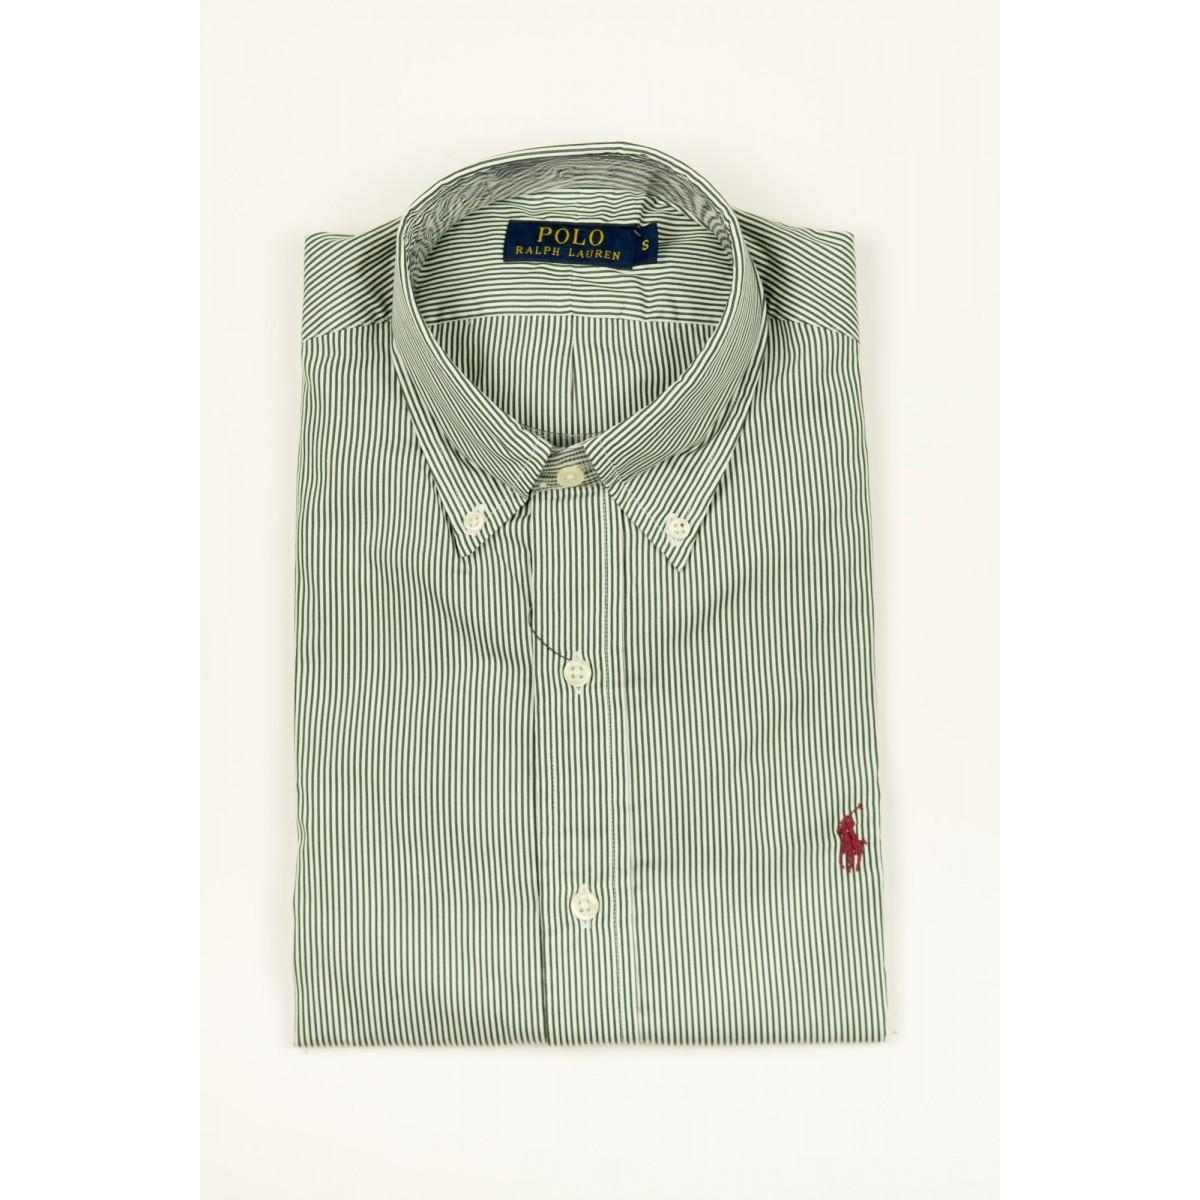 Camicia uomo Ralph lauren - A04wbdbdcpop5 C3FL2 - riga verde